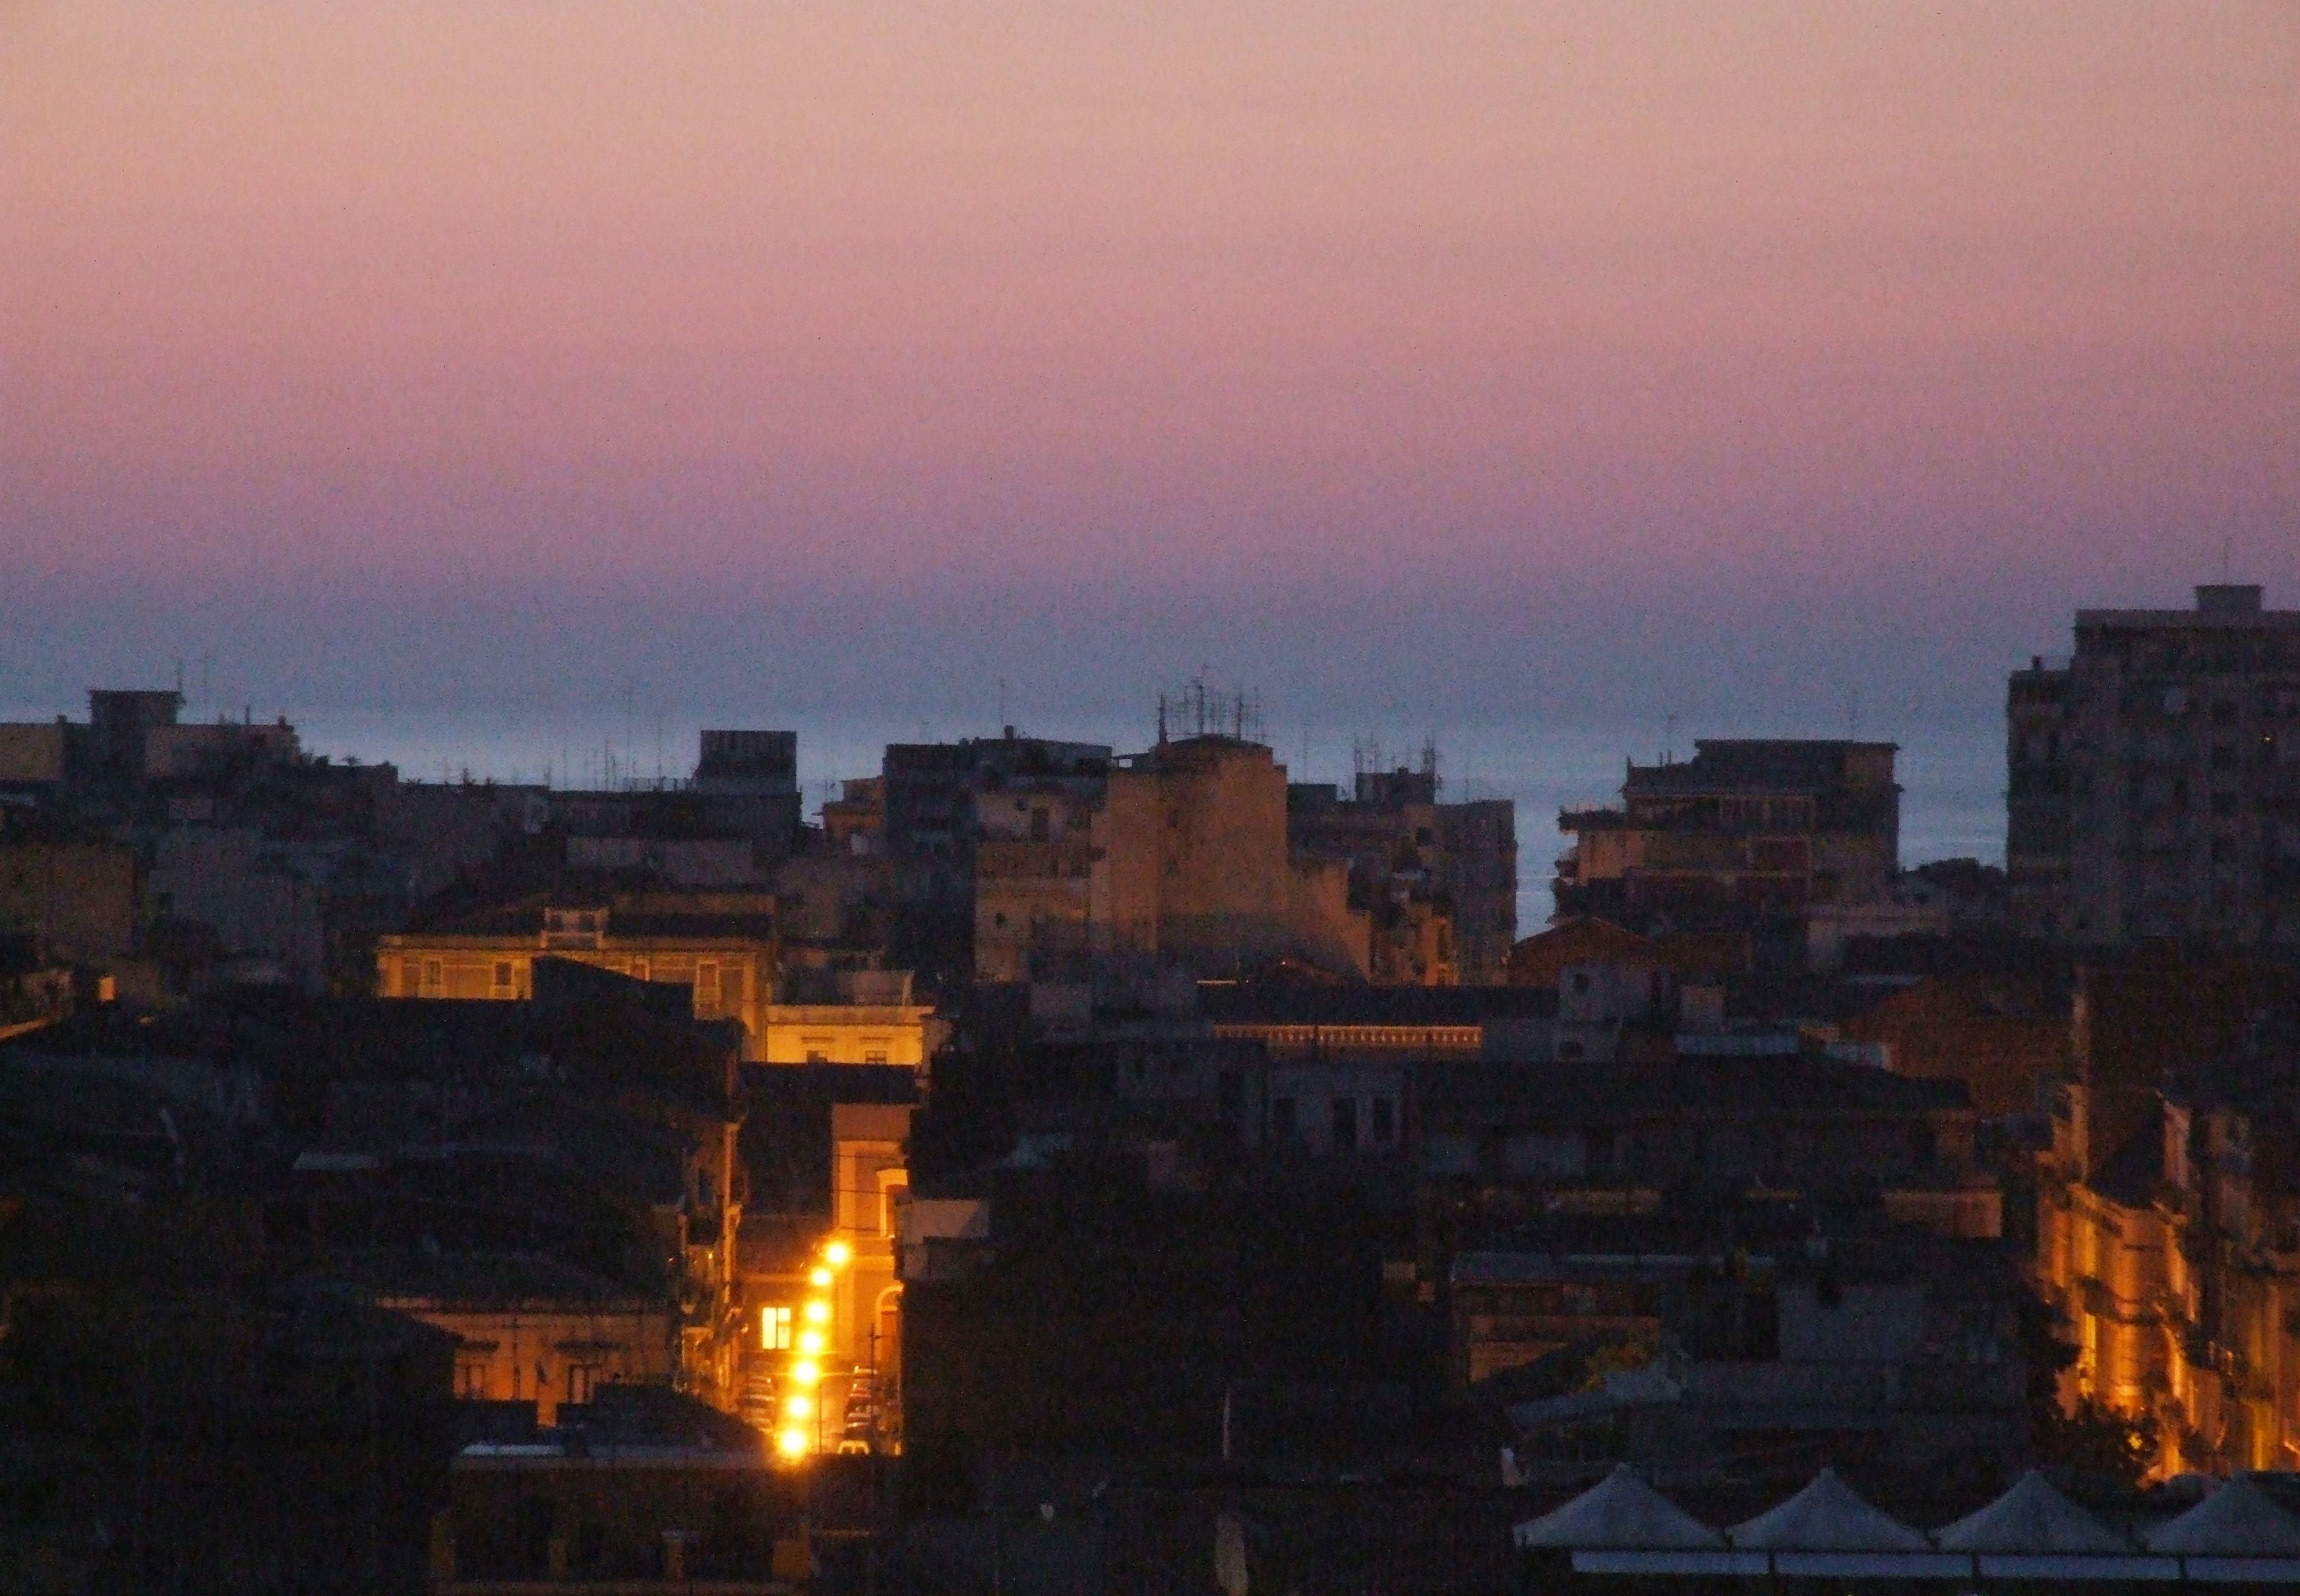 Catania-Italy - Creative Commons by gnuckx, Bebo, Public, Metacafe, News, HQ Photo